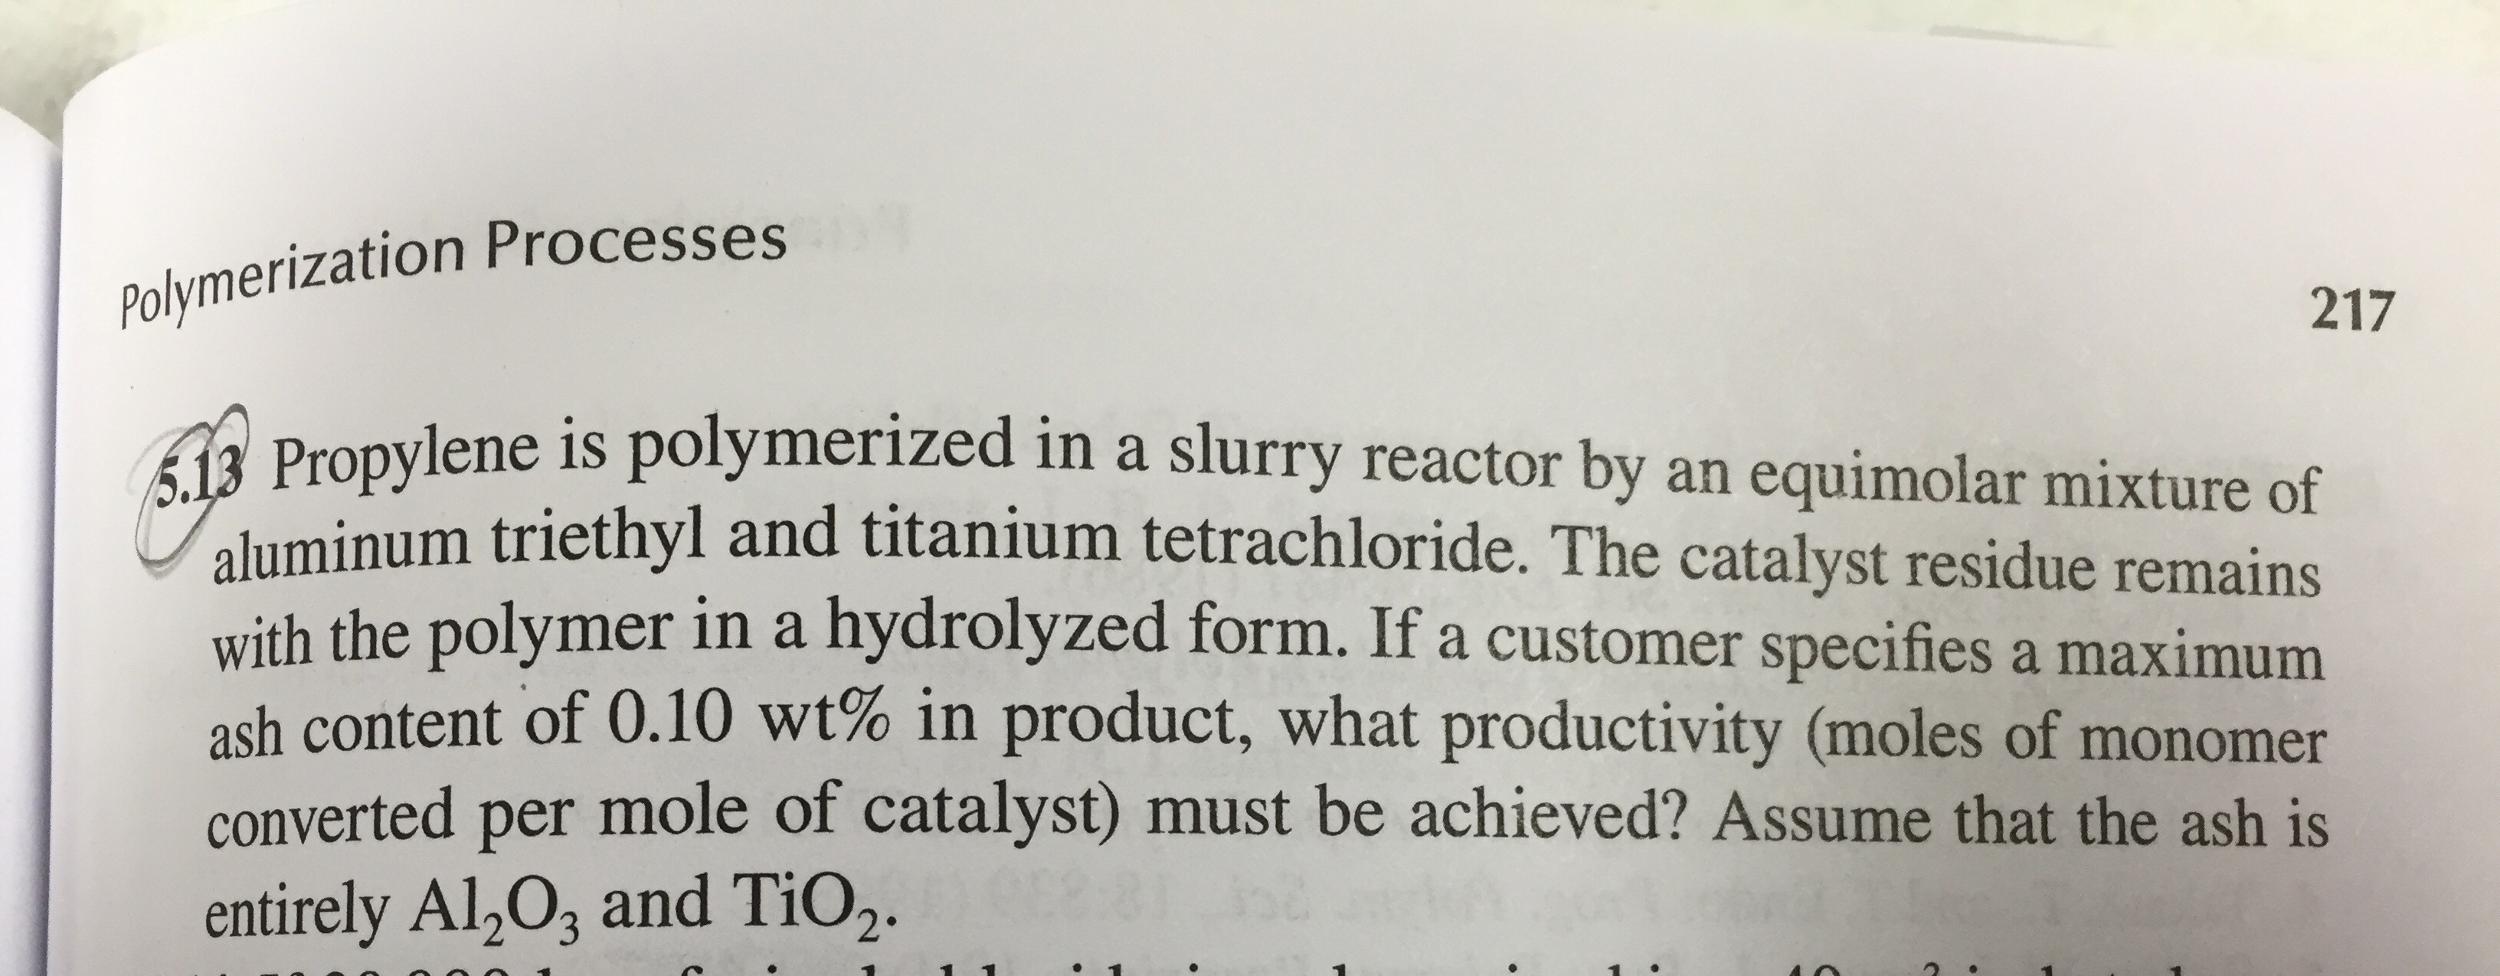 5 13 Propylene Is Polymerized In A Slurry Reactor     | Chegg com